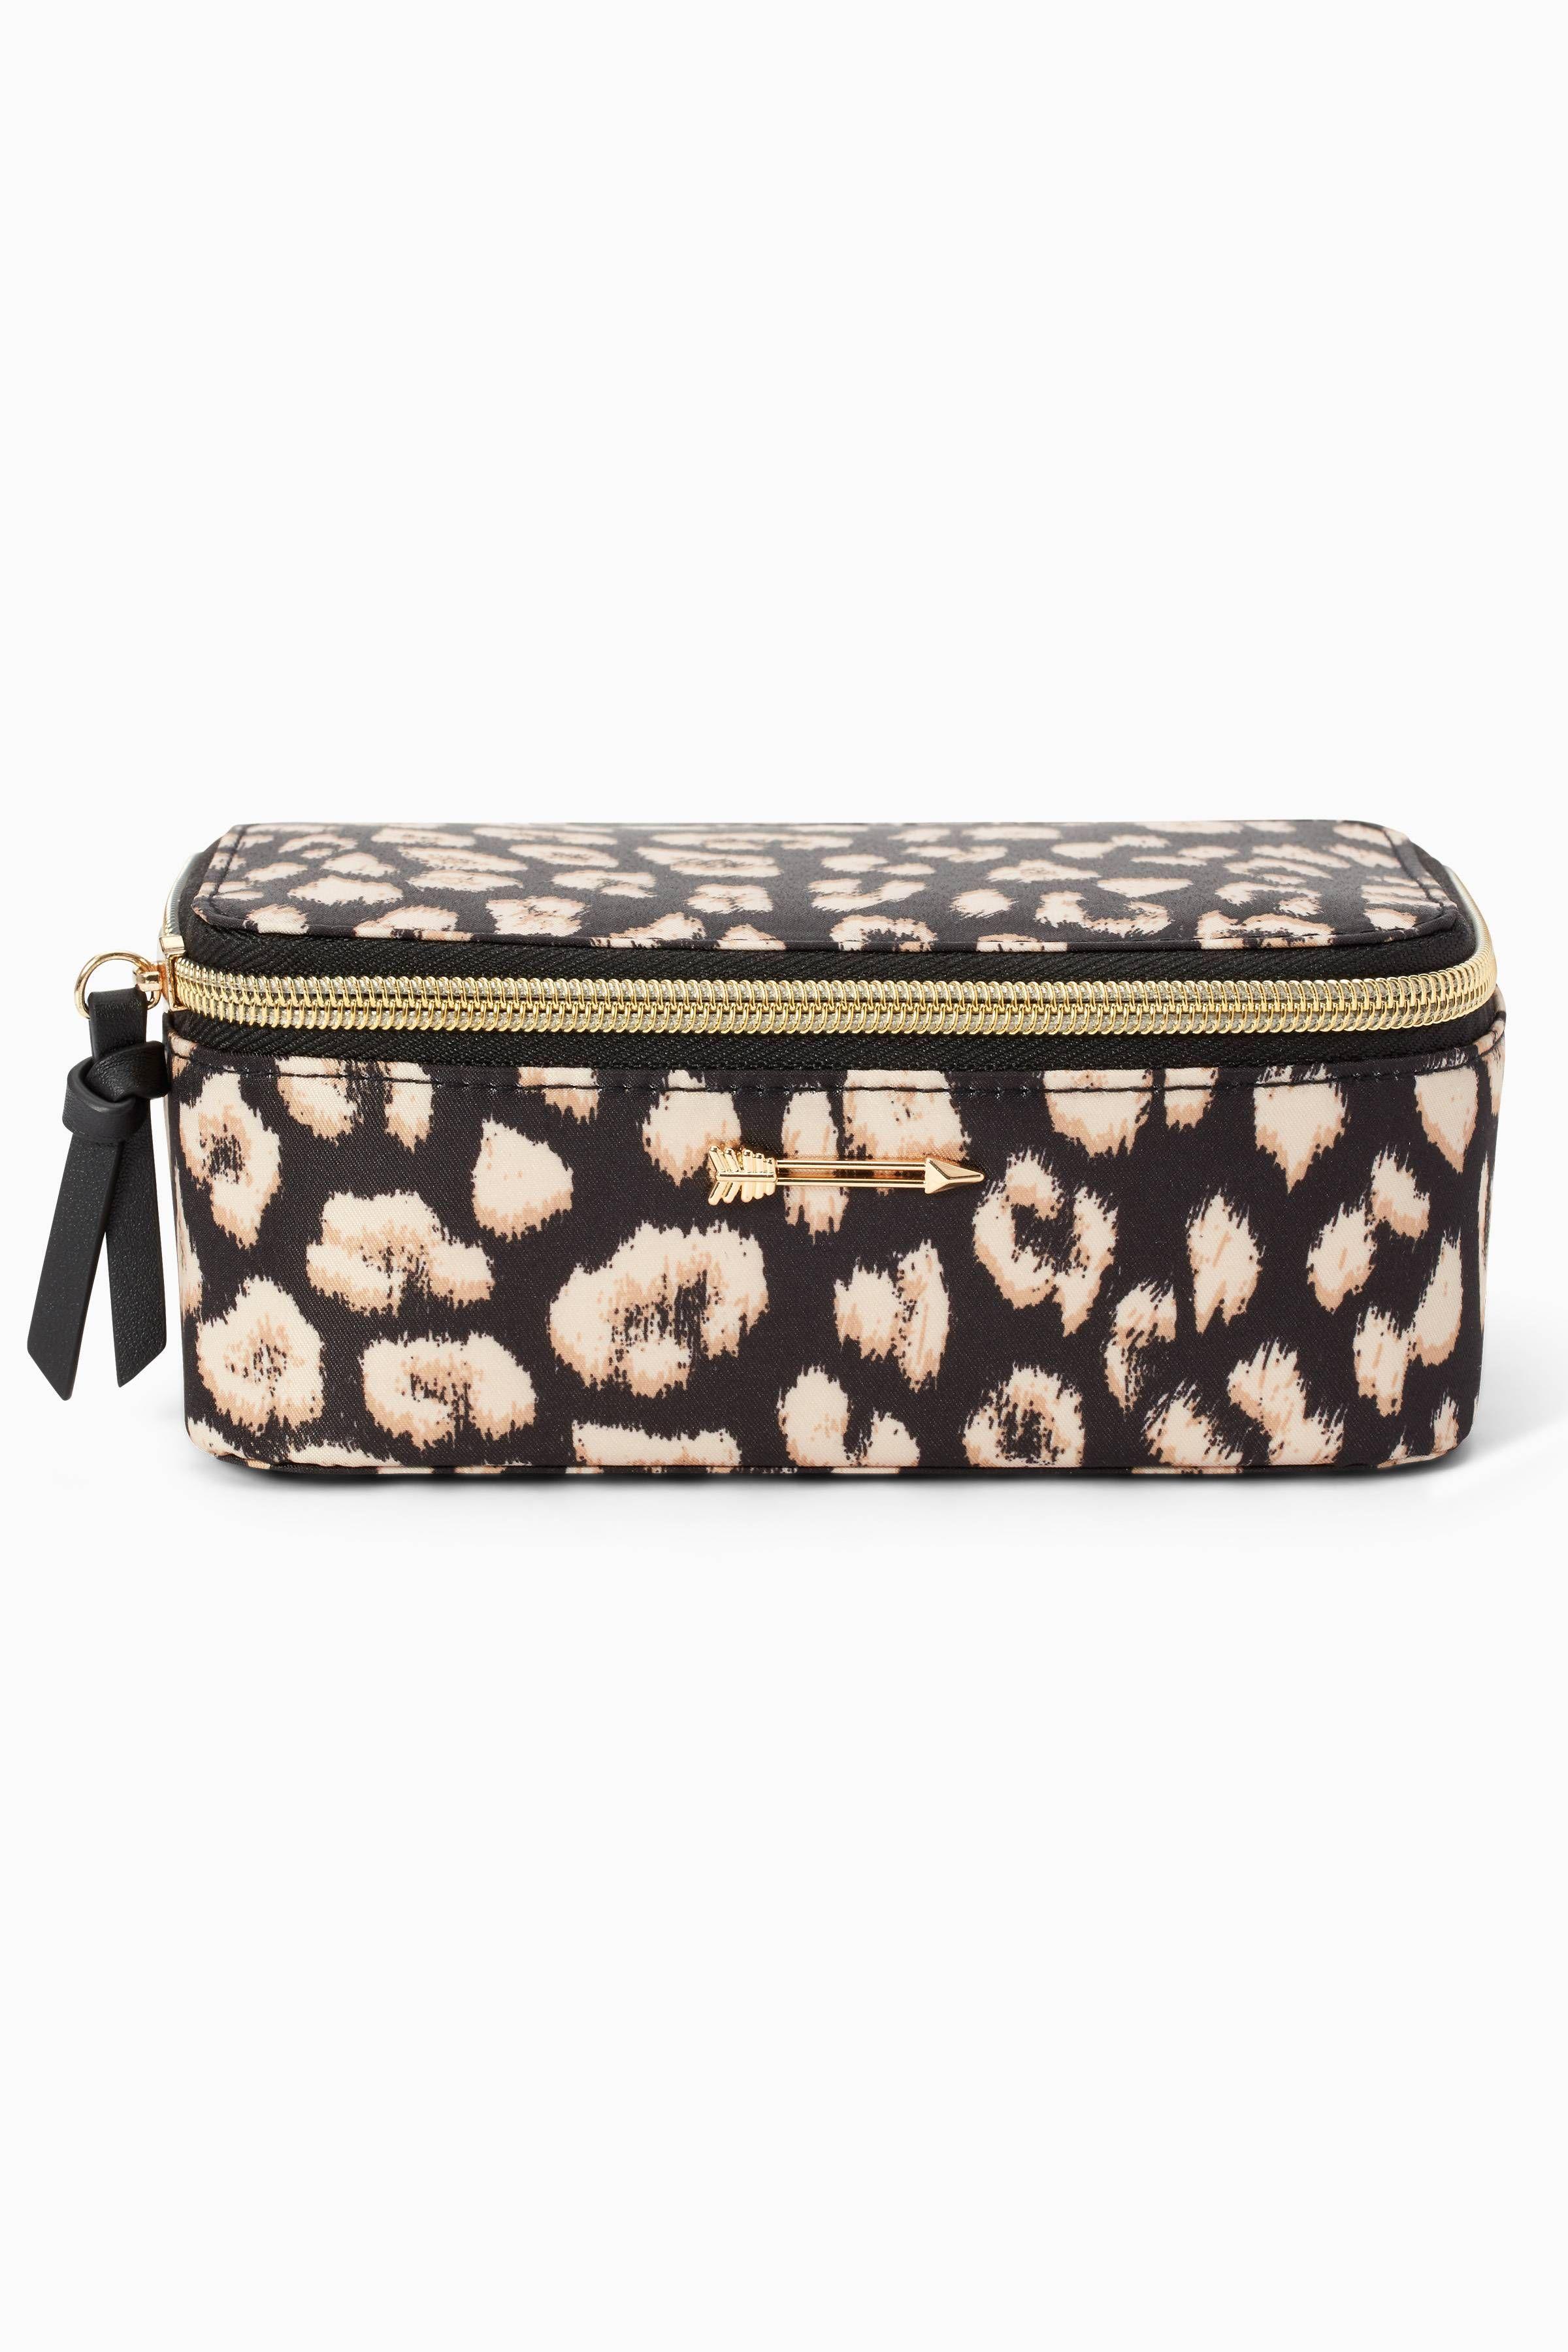 4651264174ce7 Travel Jewelry Box - Leopard